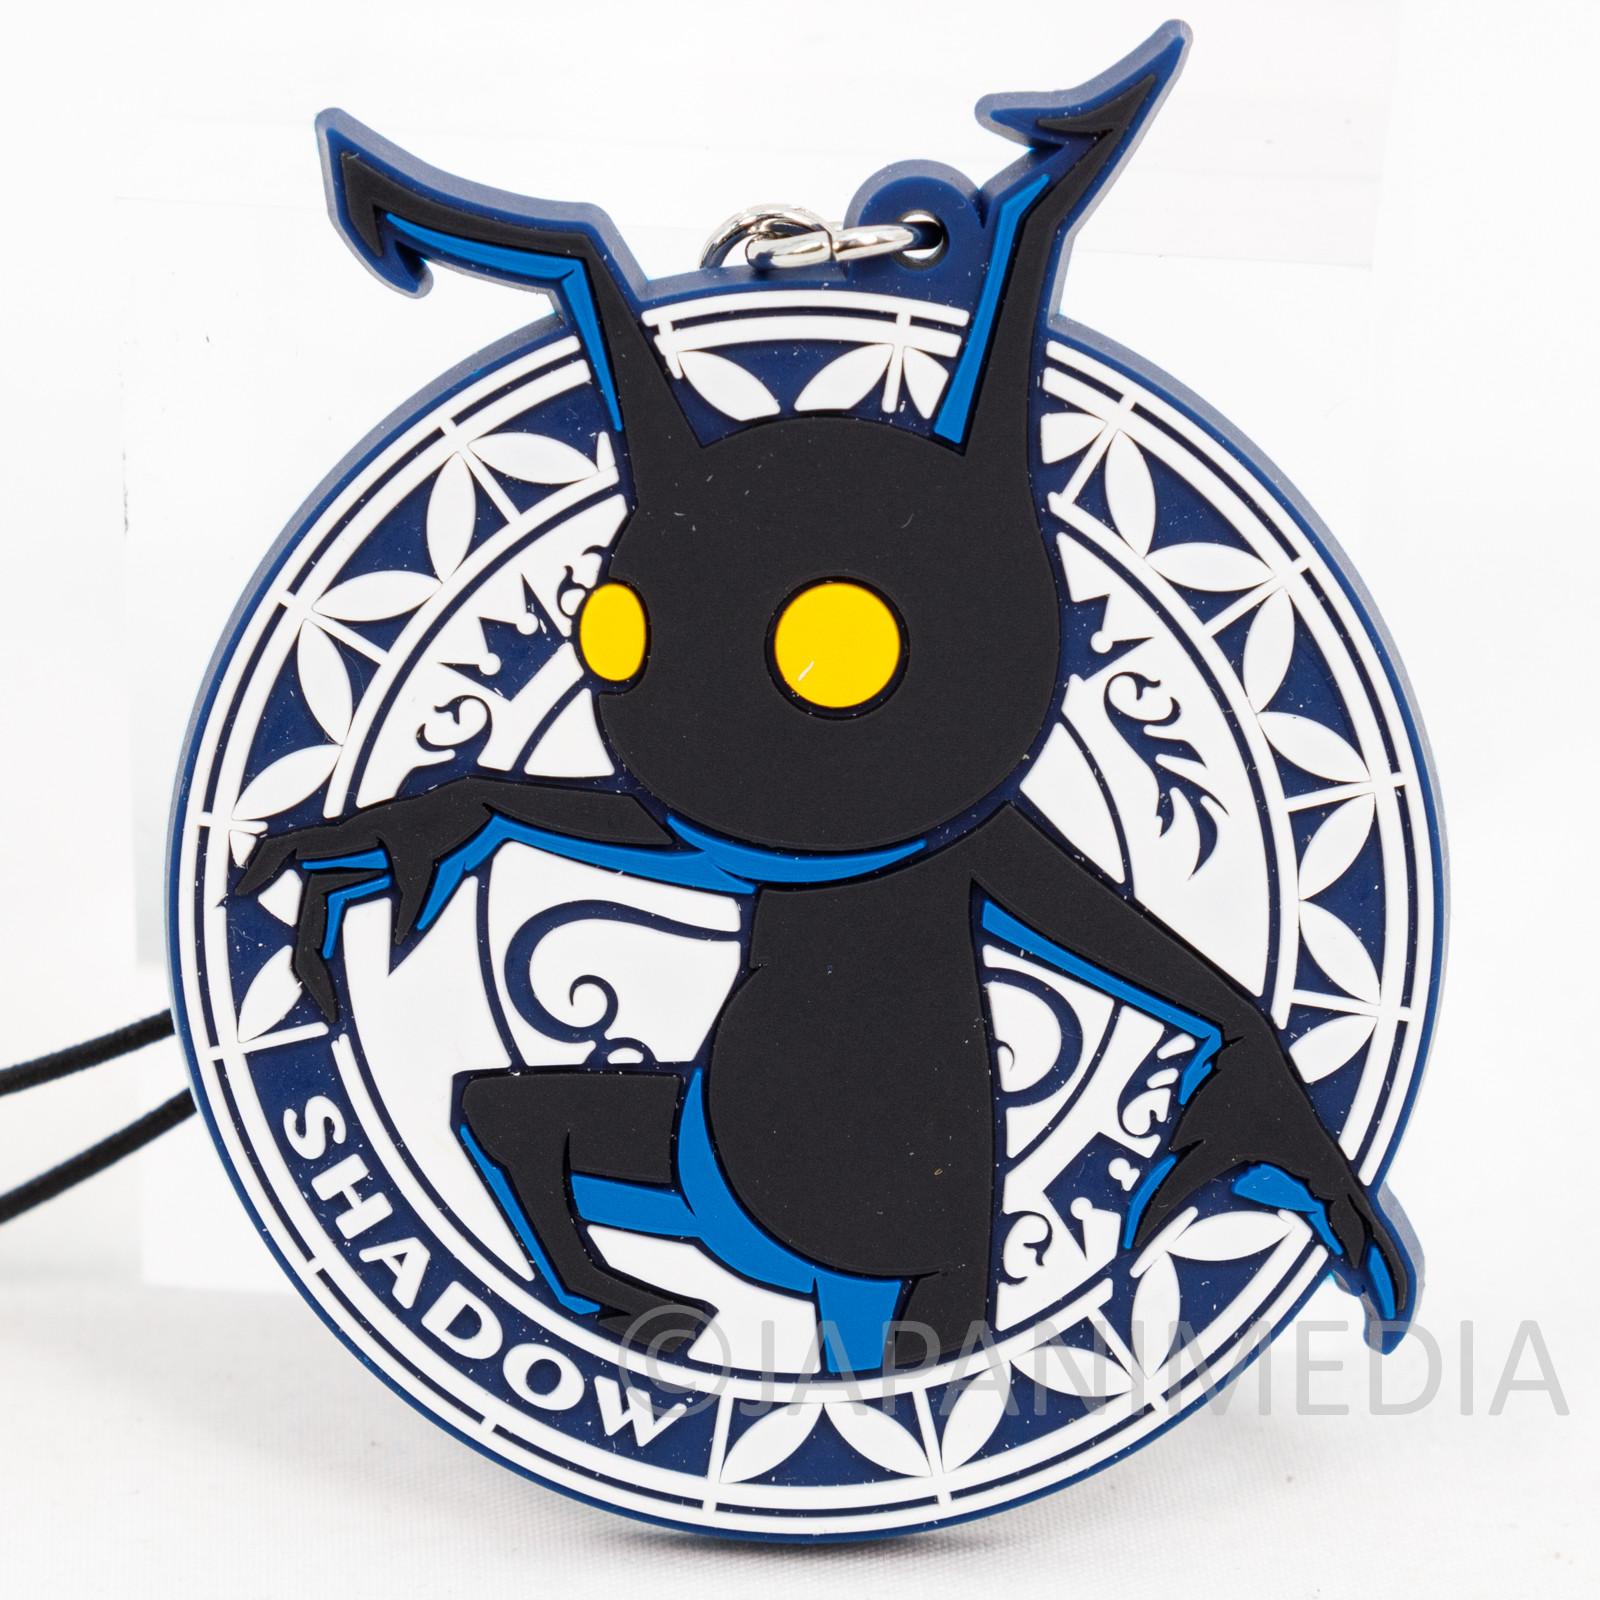 Kingdom Hearts SHADOW Mascot Rubber Strap Square Enix JAPAN